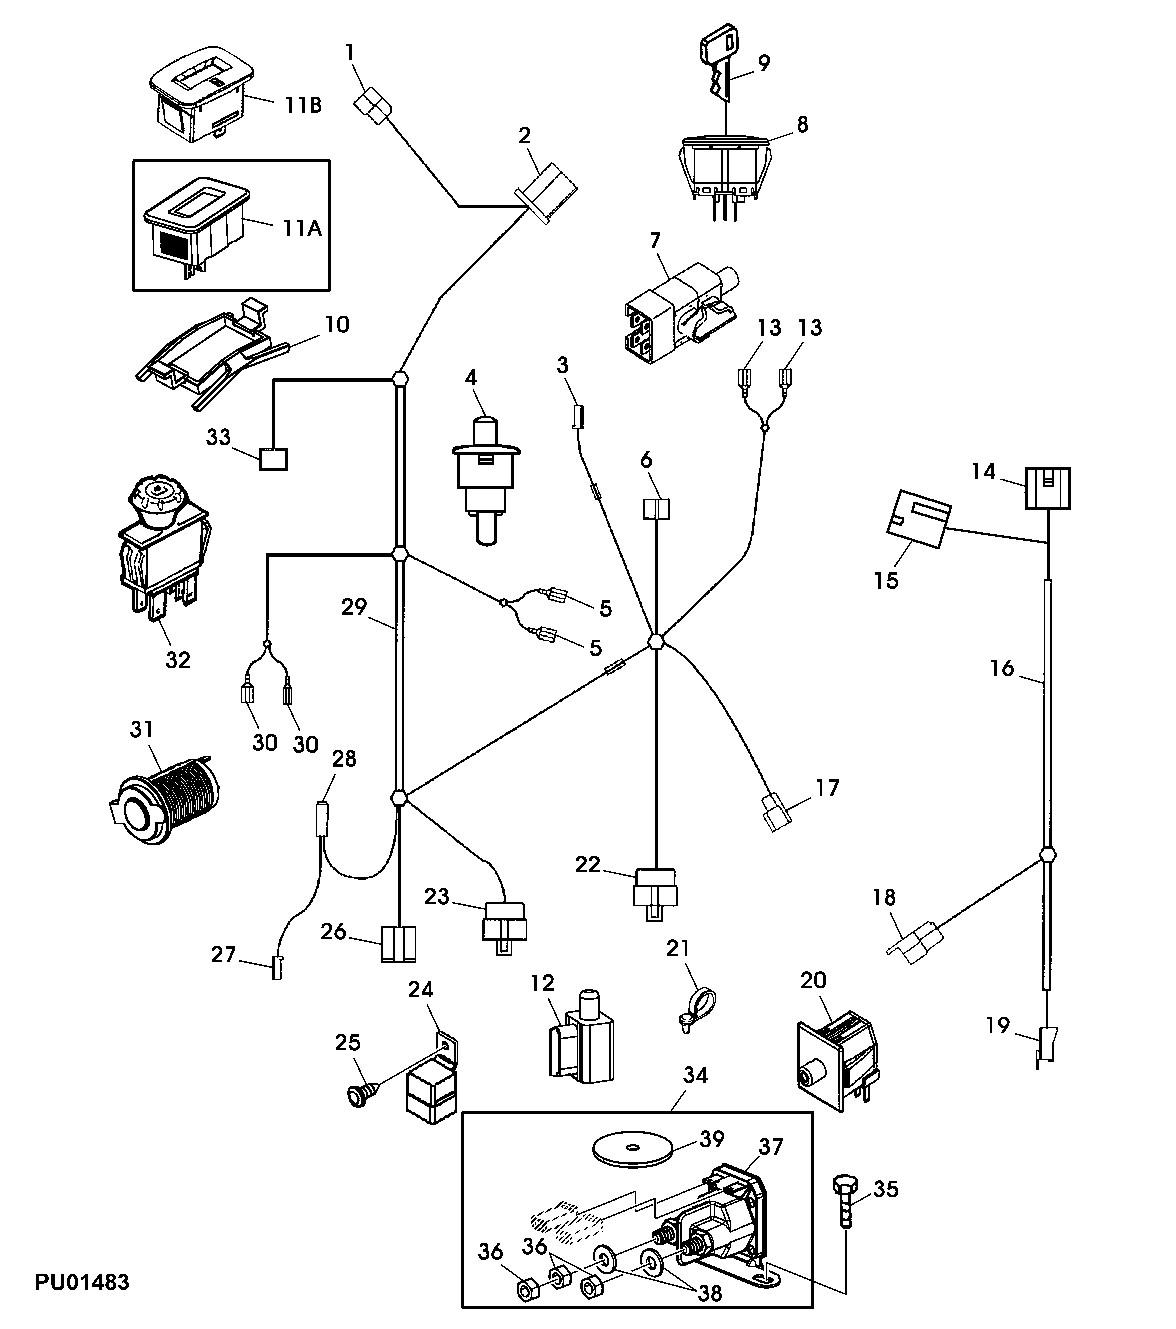 muncie pto wiring diagram electrical actuator